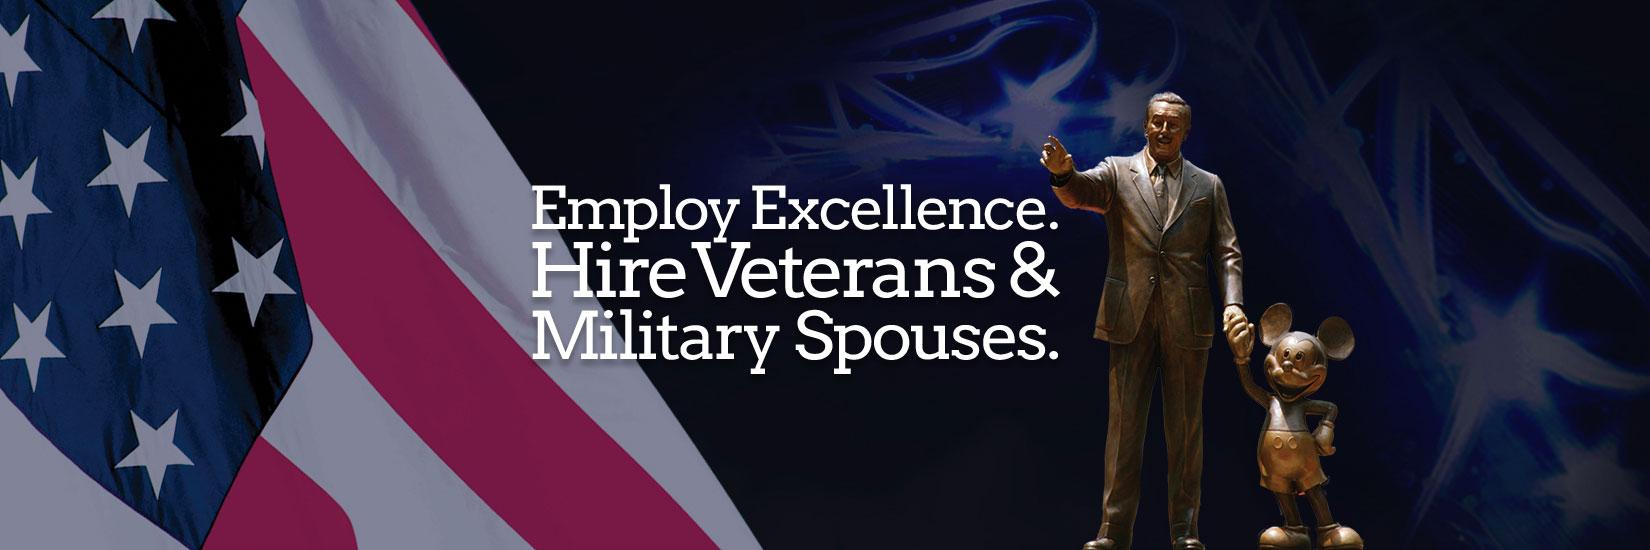 Employ Excellence. Hire Veterans.